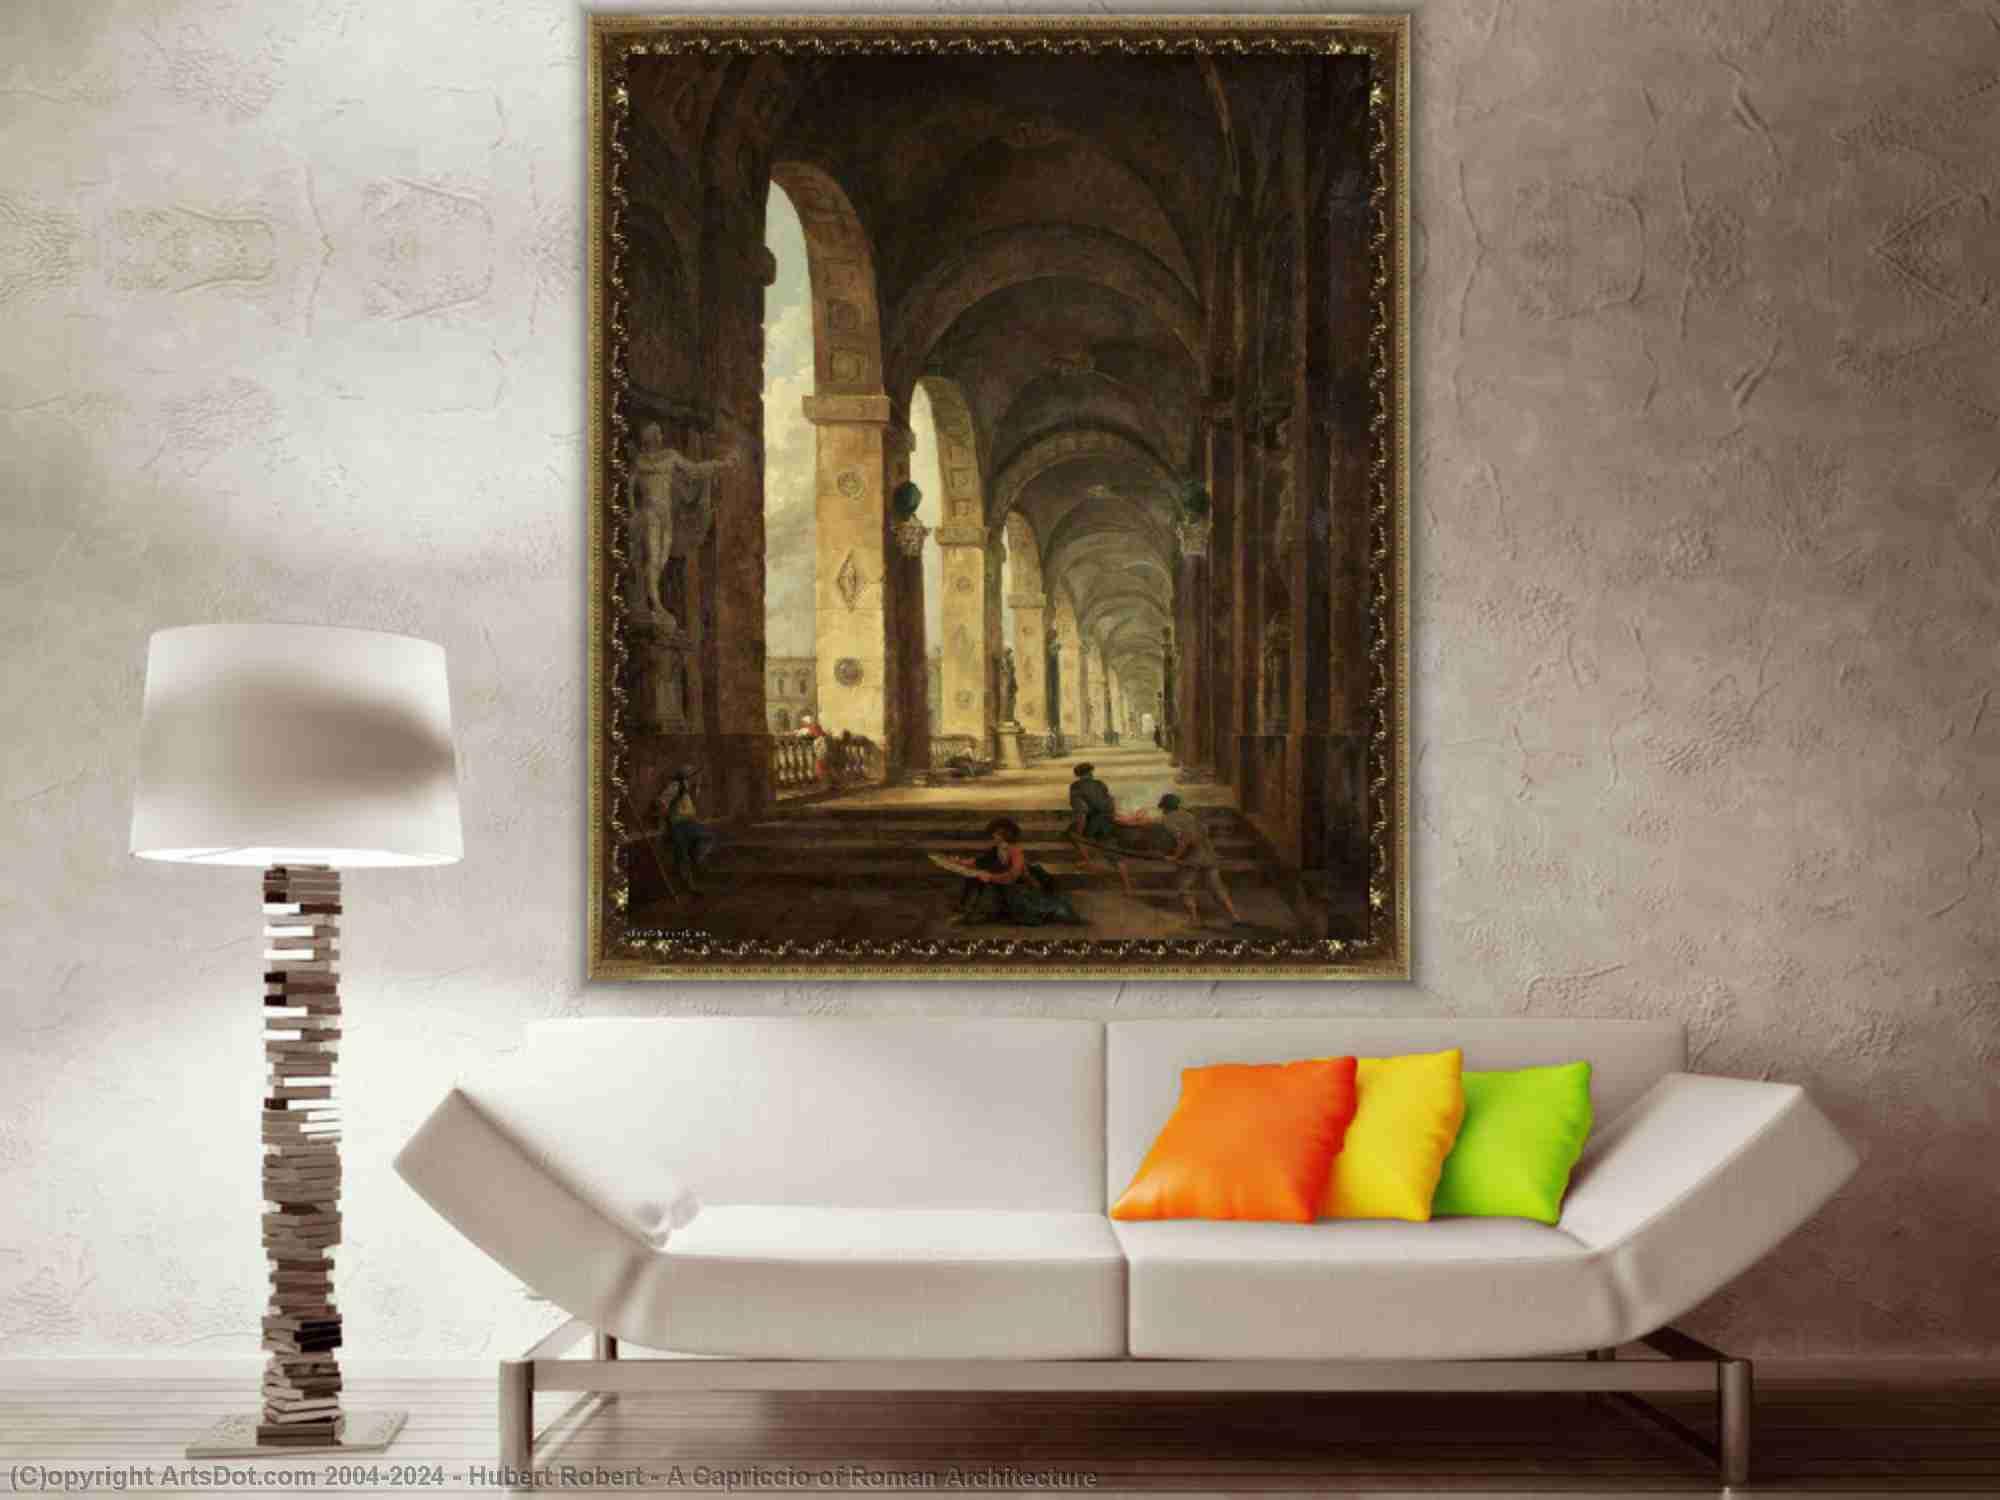 Hubert Robert - A カプリッチオ の ローマ建築